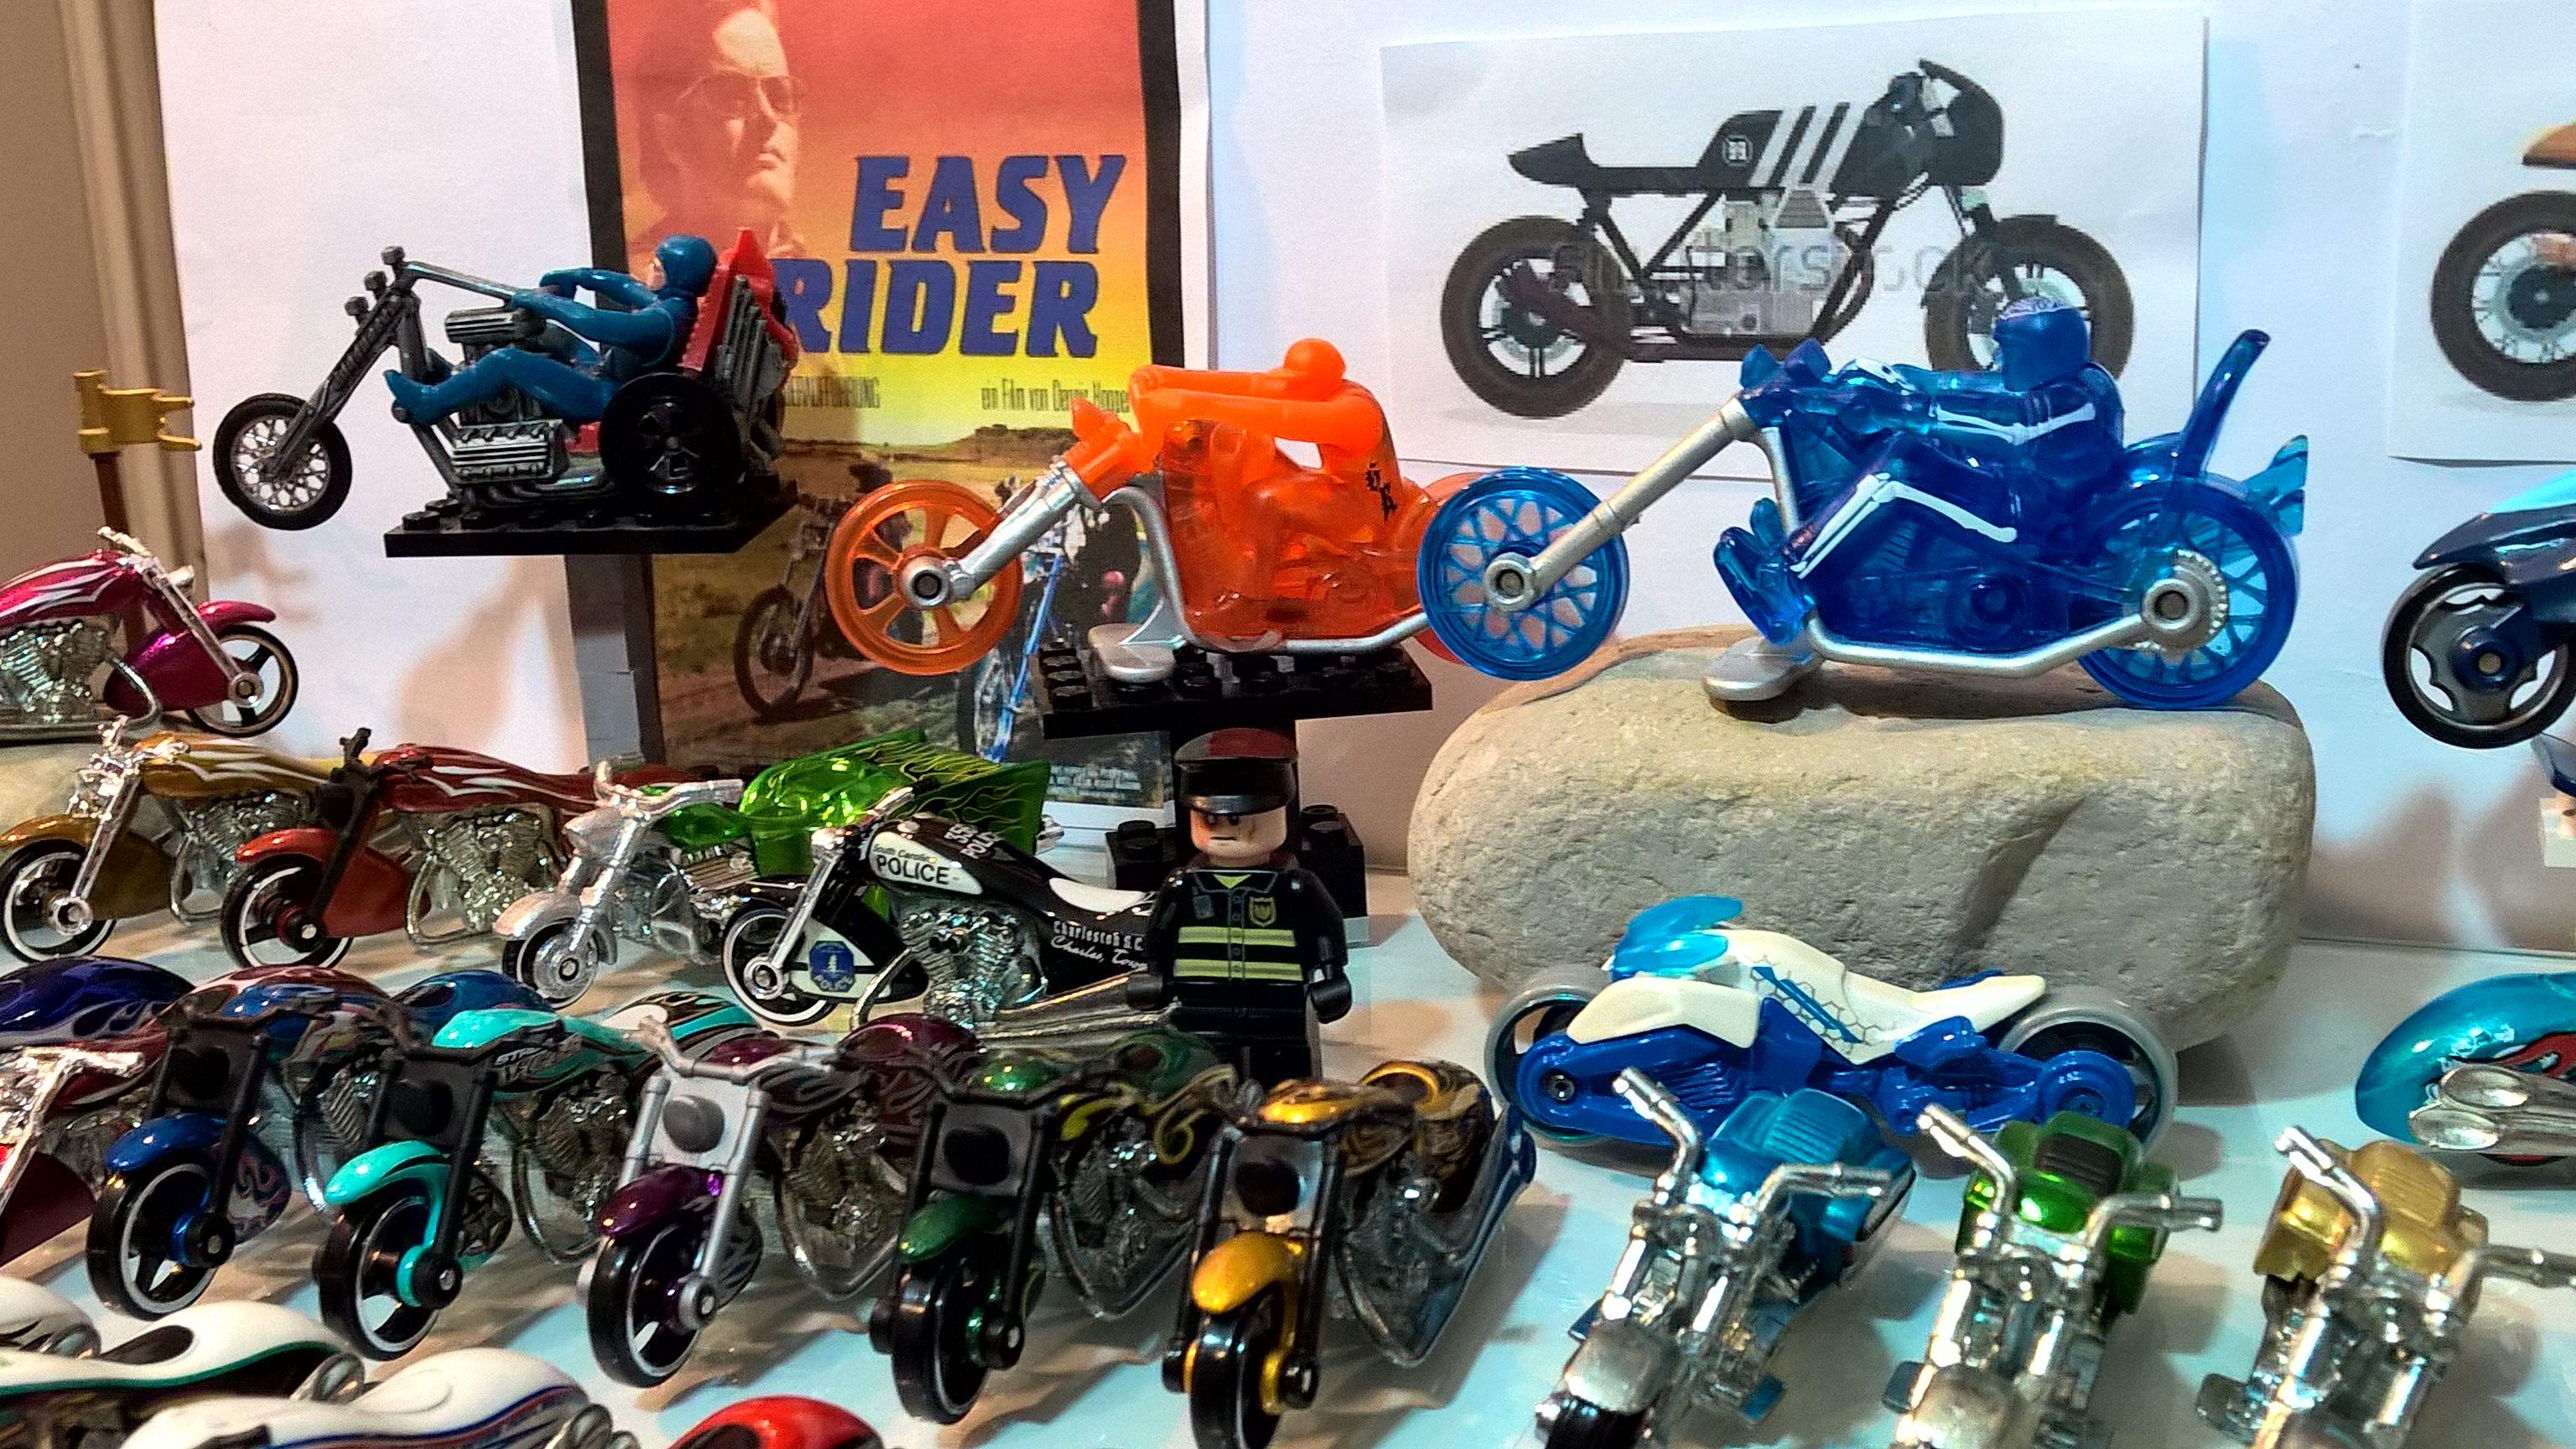 Hot Wheels Diorama Motorcycles Easy Rider Hot Wheels Bike Wheel